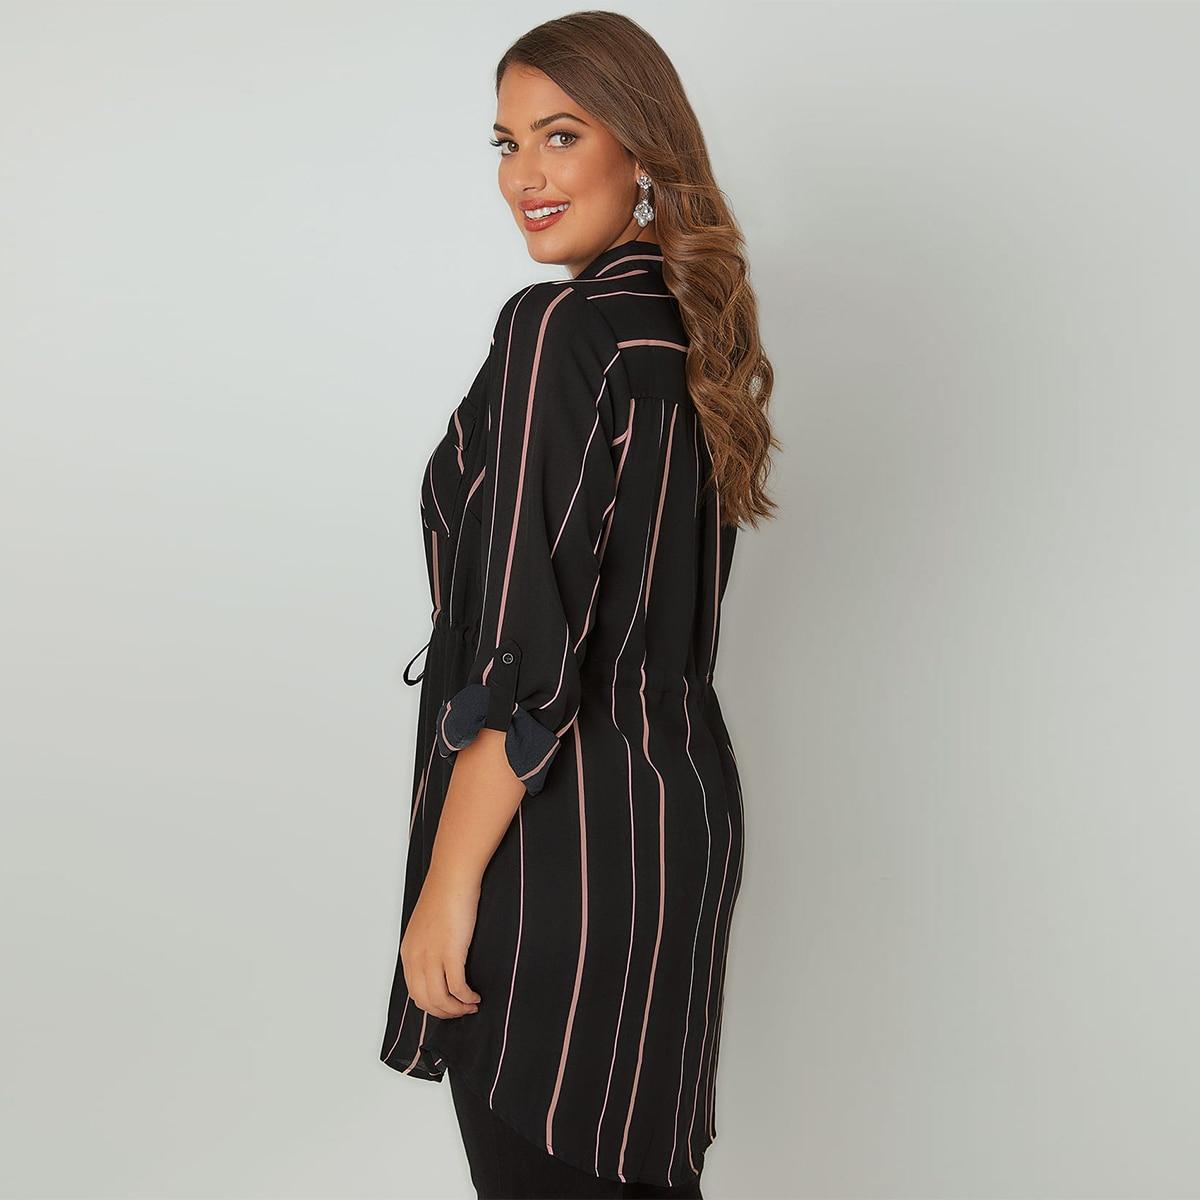 MCO 2018 Spring Simple Tie Waist Plus Size OL Stripe Shirt Casual Oversize Long Office Ladies Blouse Basic Big Women Top 6xl 7xl 2